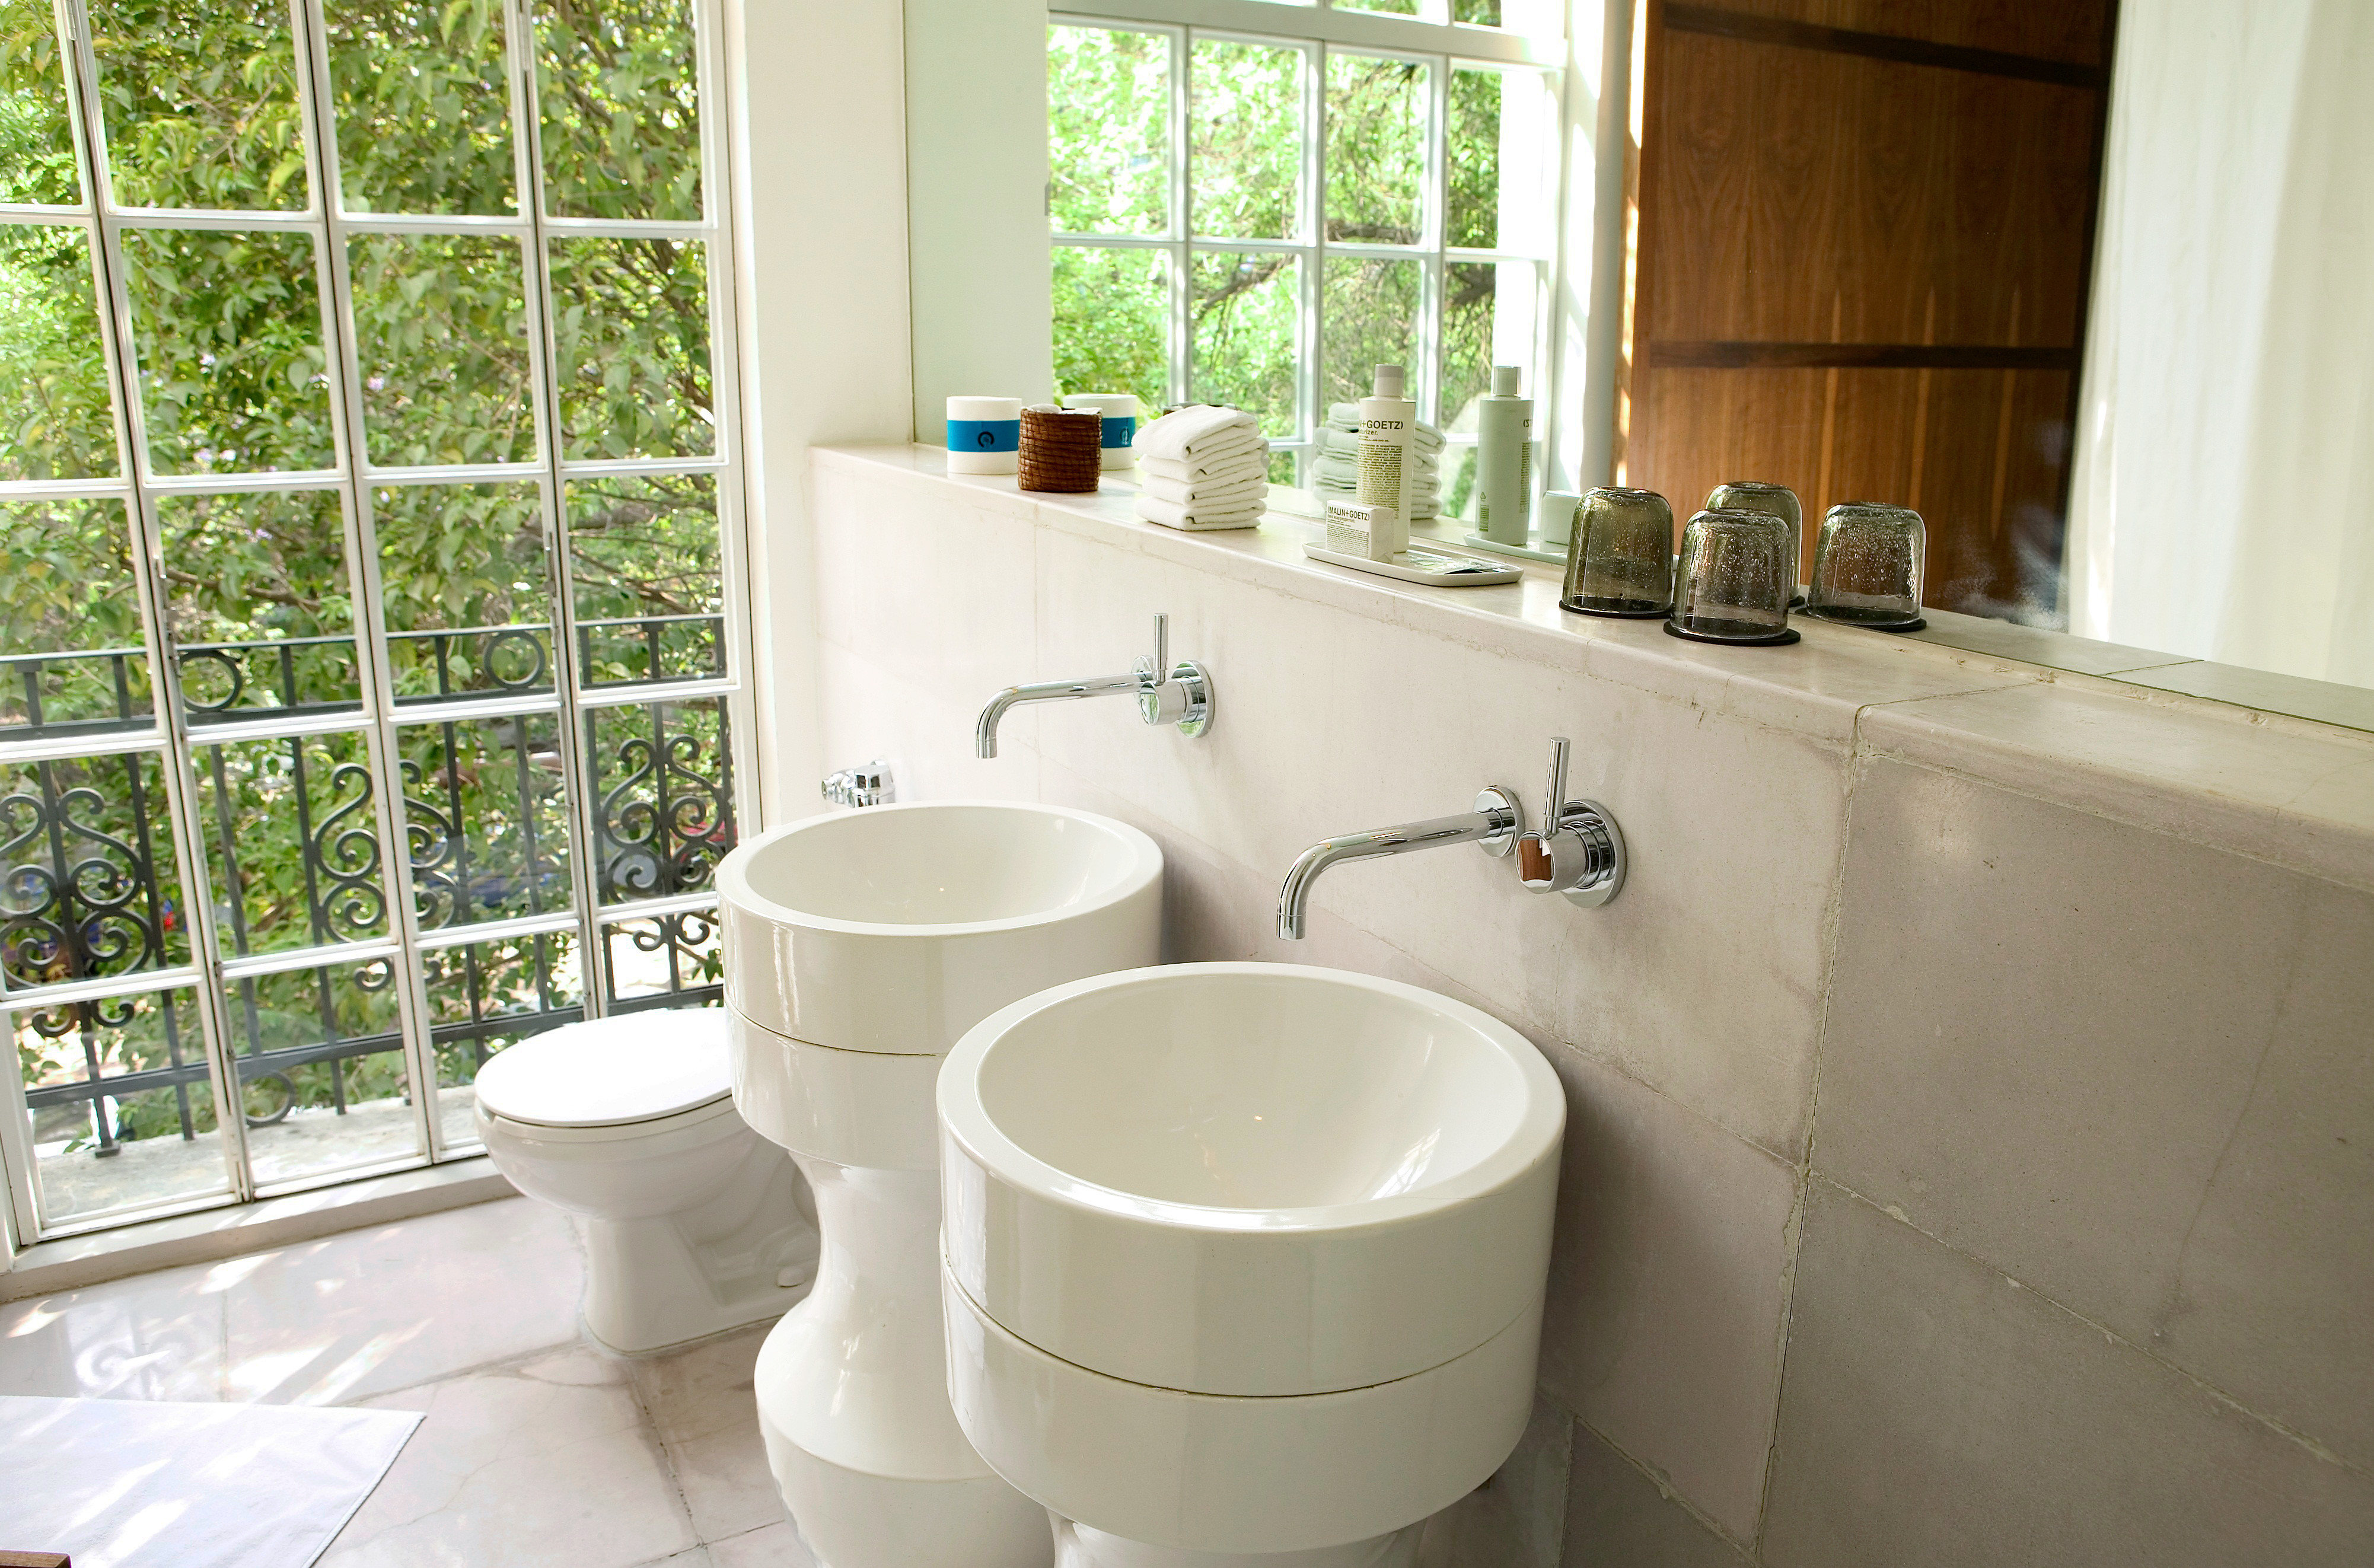 Bath Hip Modern bathroom property bidet home plumbing fixture flooring tub